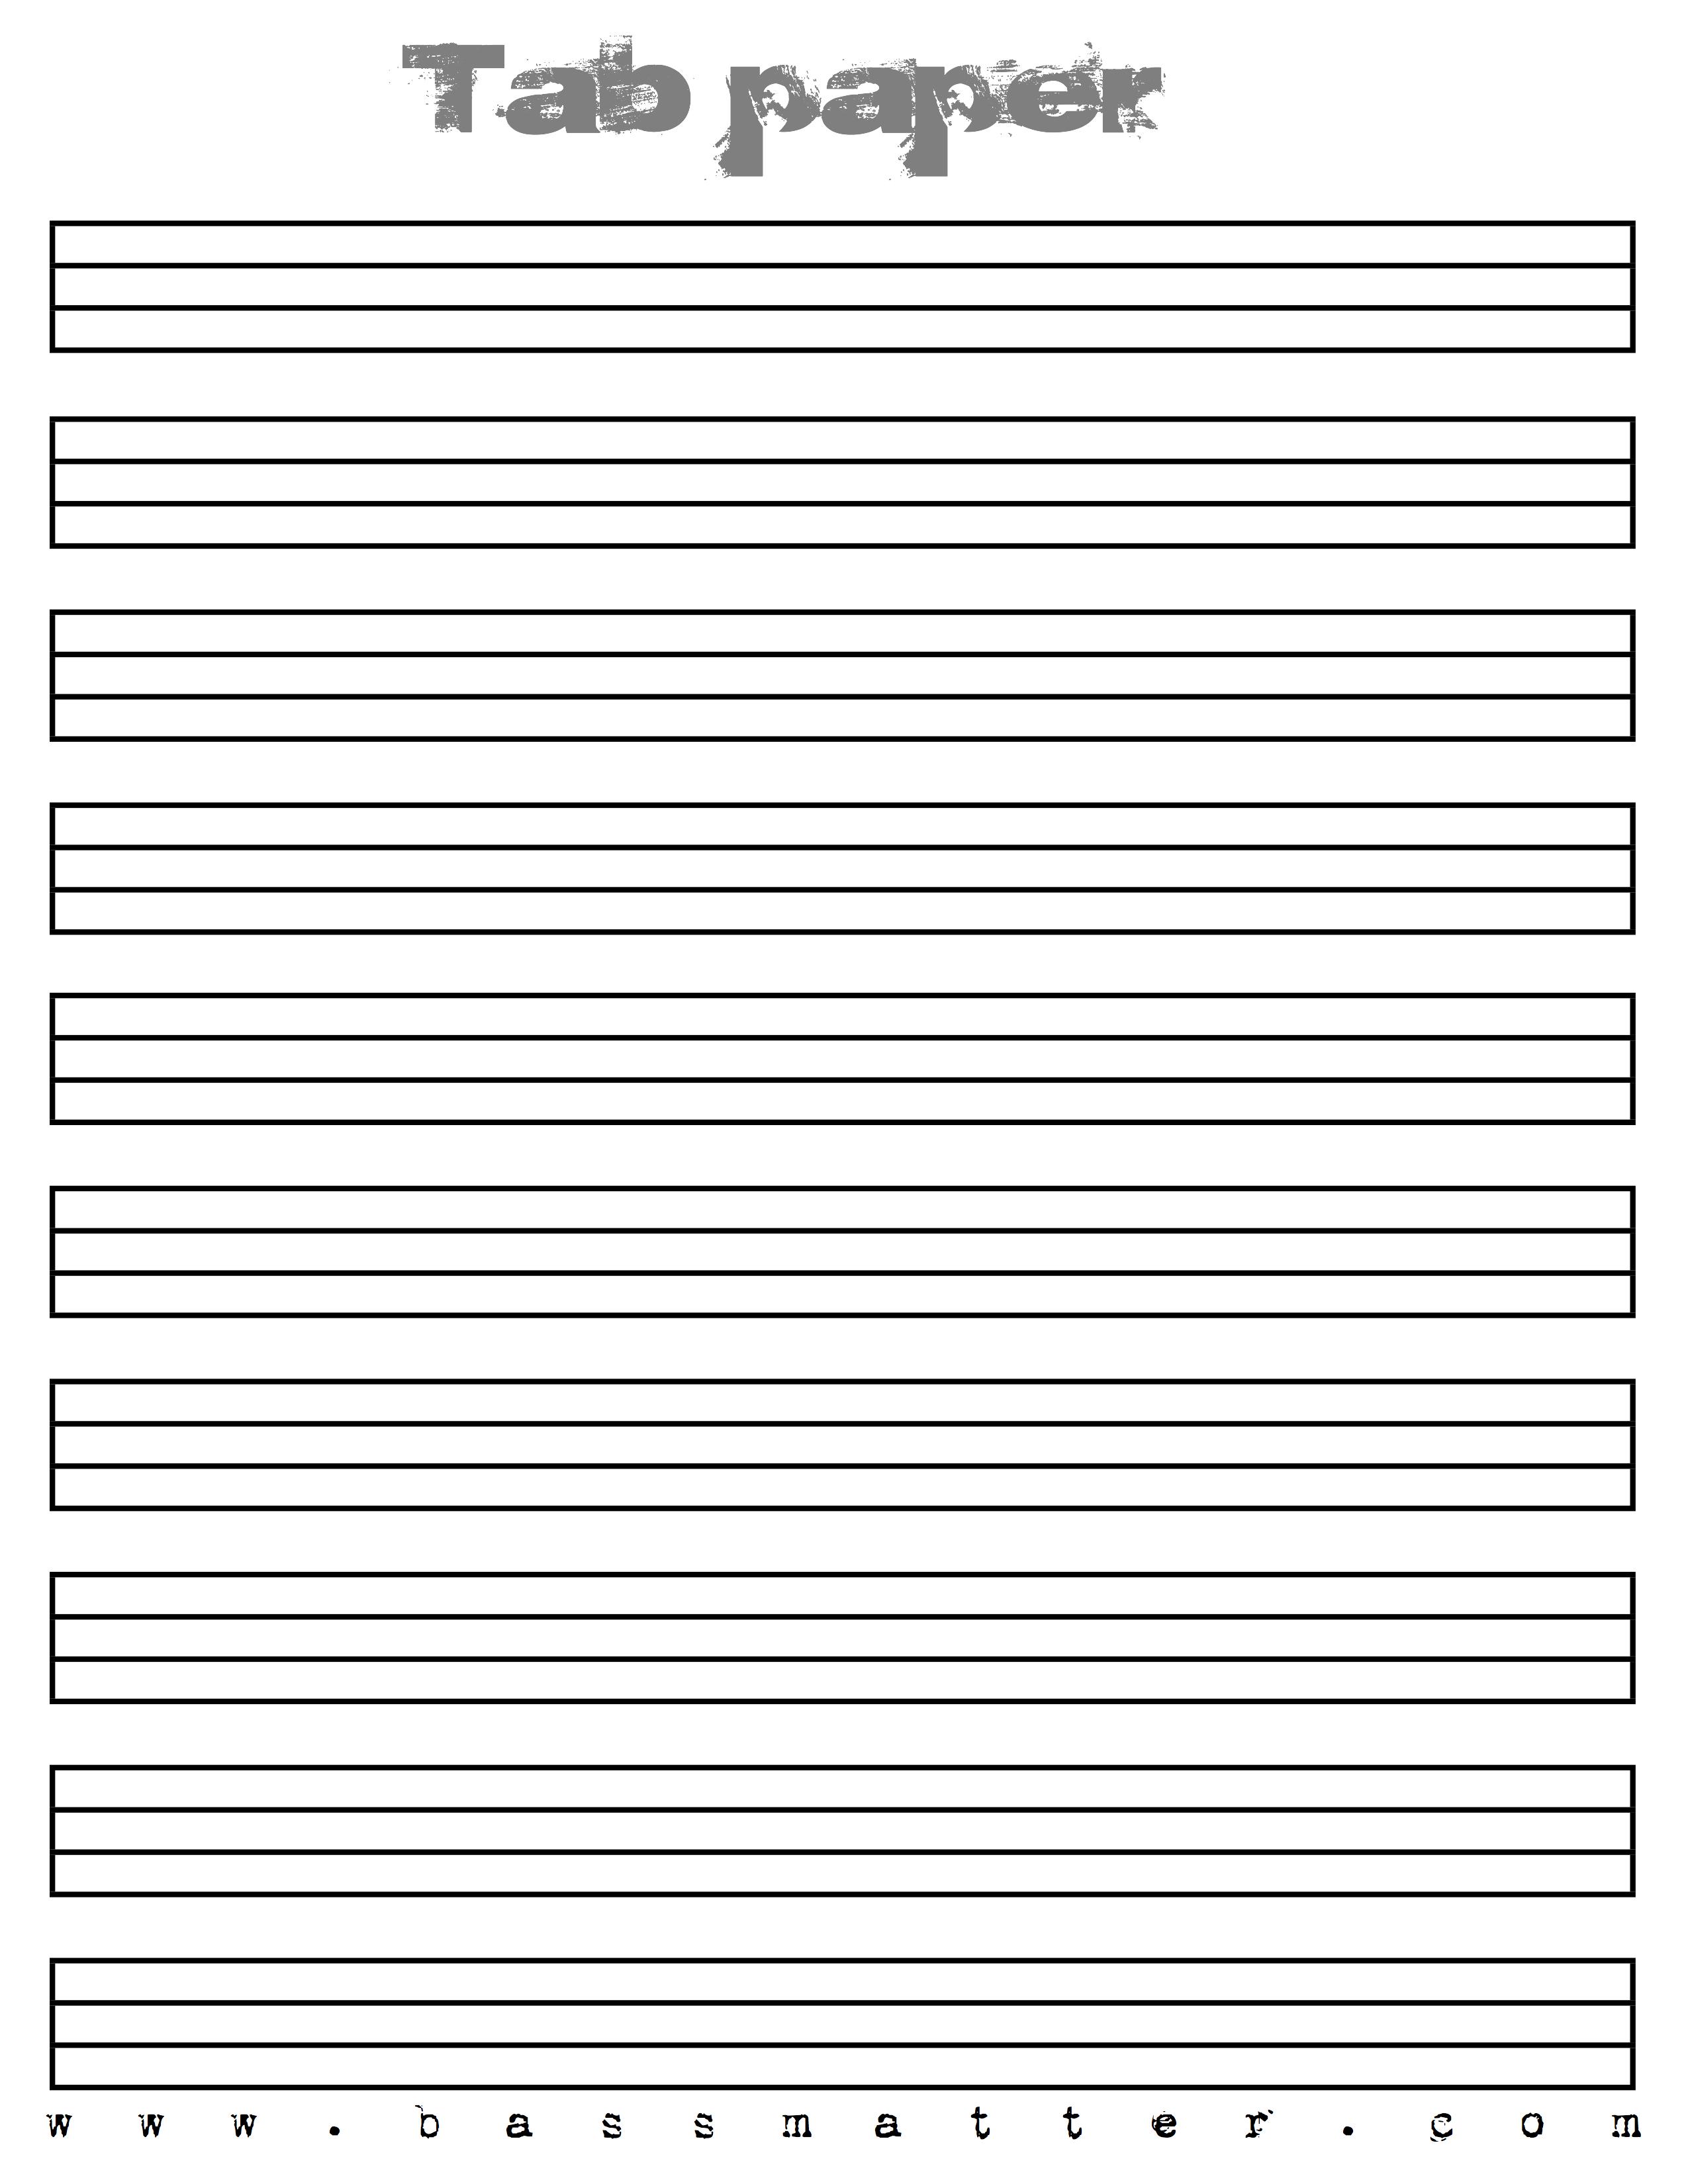 image regarding Tablature Paper Printable named Tab Paper 4 string Spokane B Classes (Spokane and